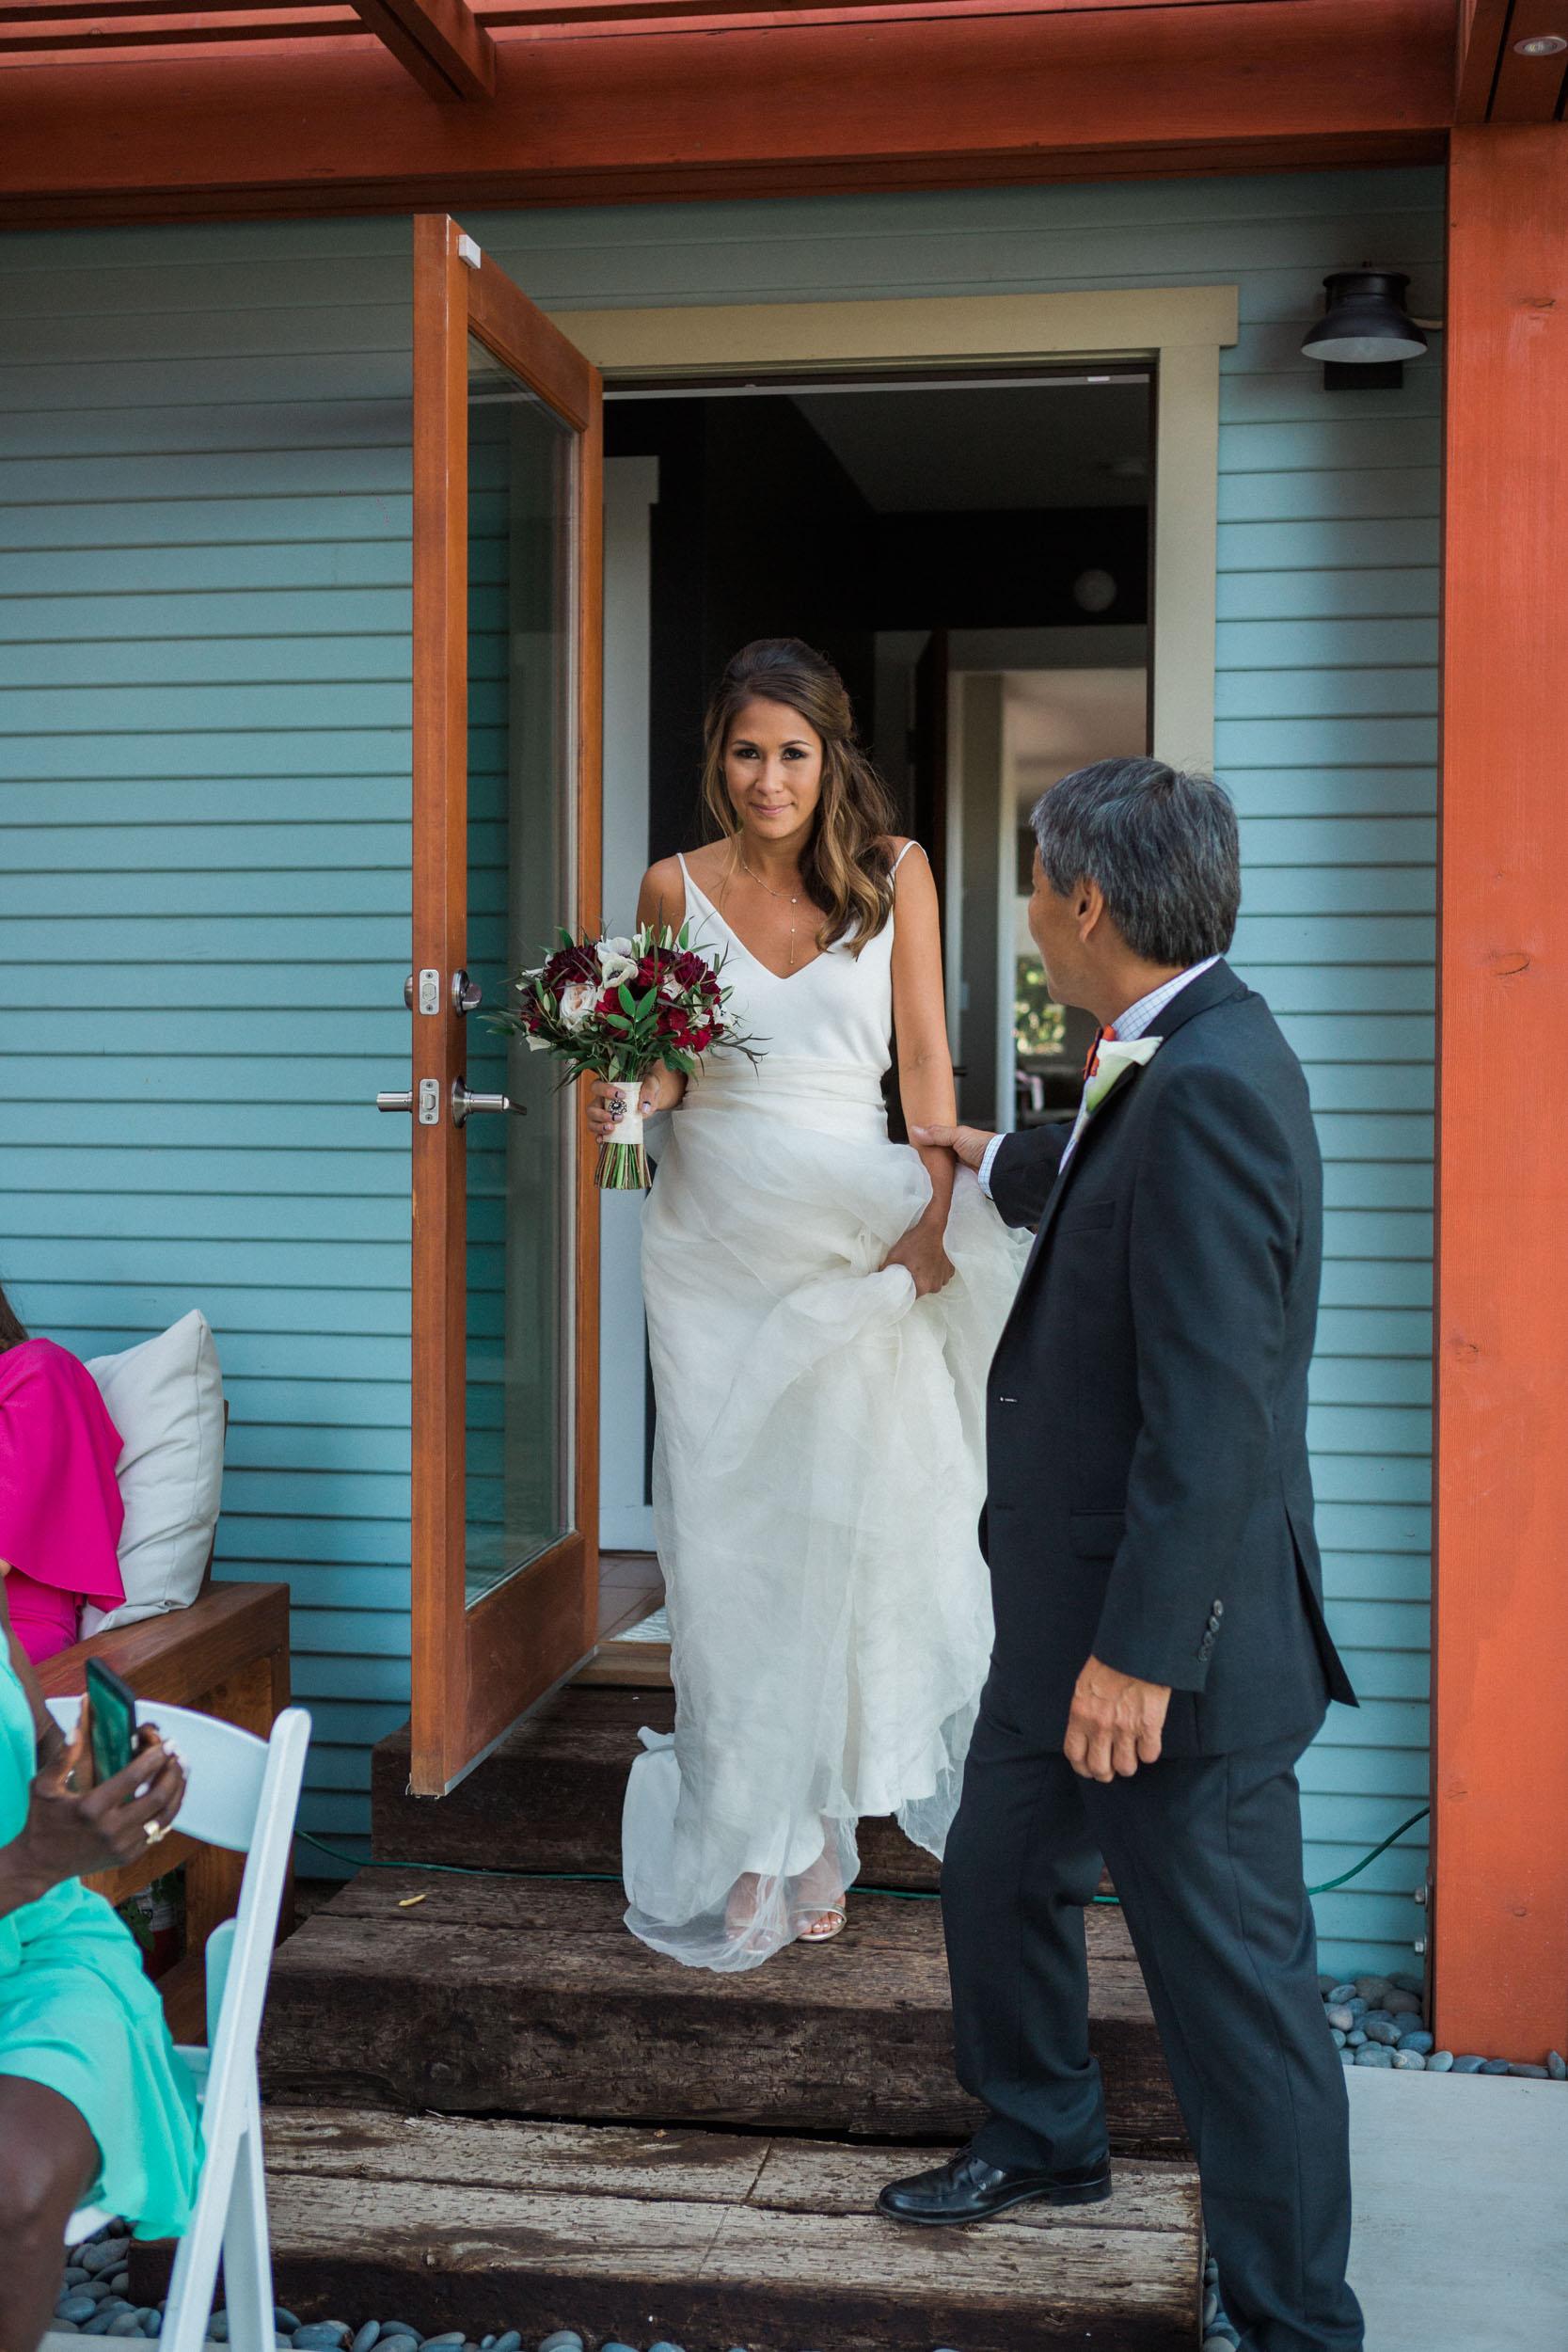 BKM-Photography-Highland-Park-Los-Angeles-Backyard-Wedding-0024.jpg